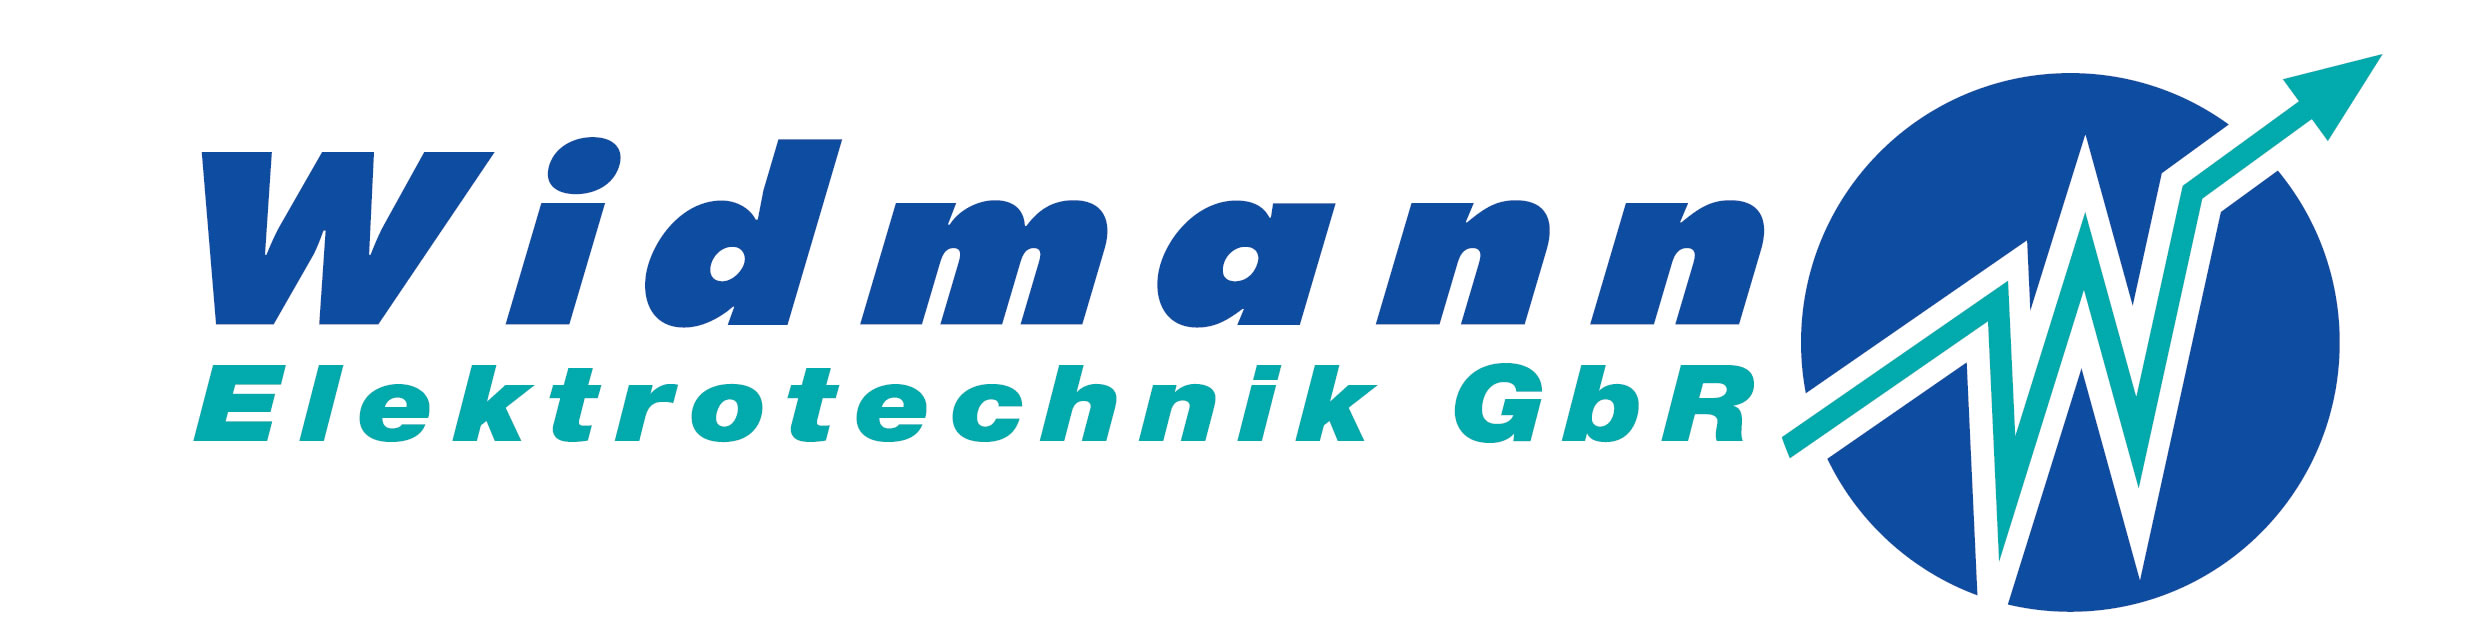 Widmann-Elektrotechnik GbR